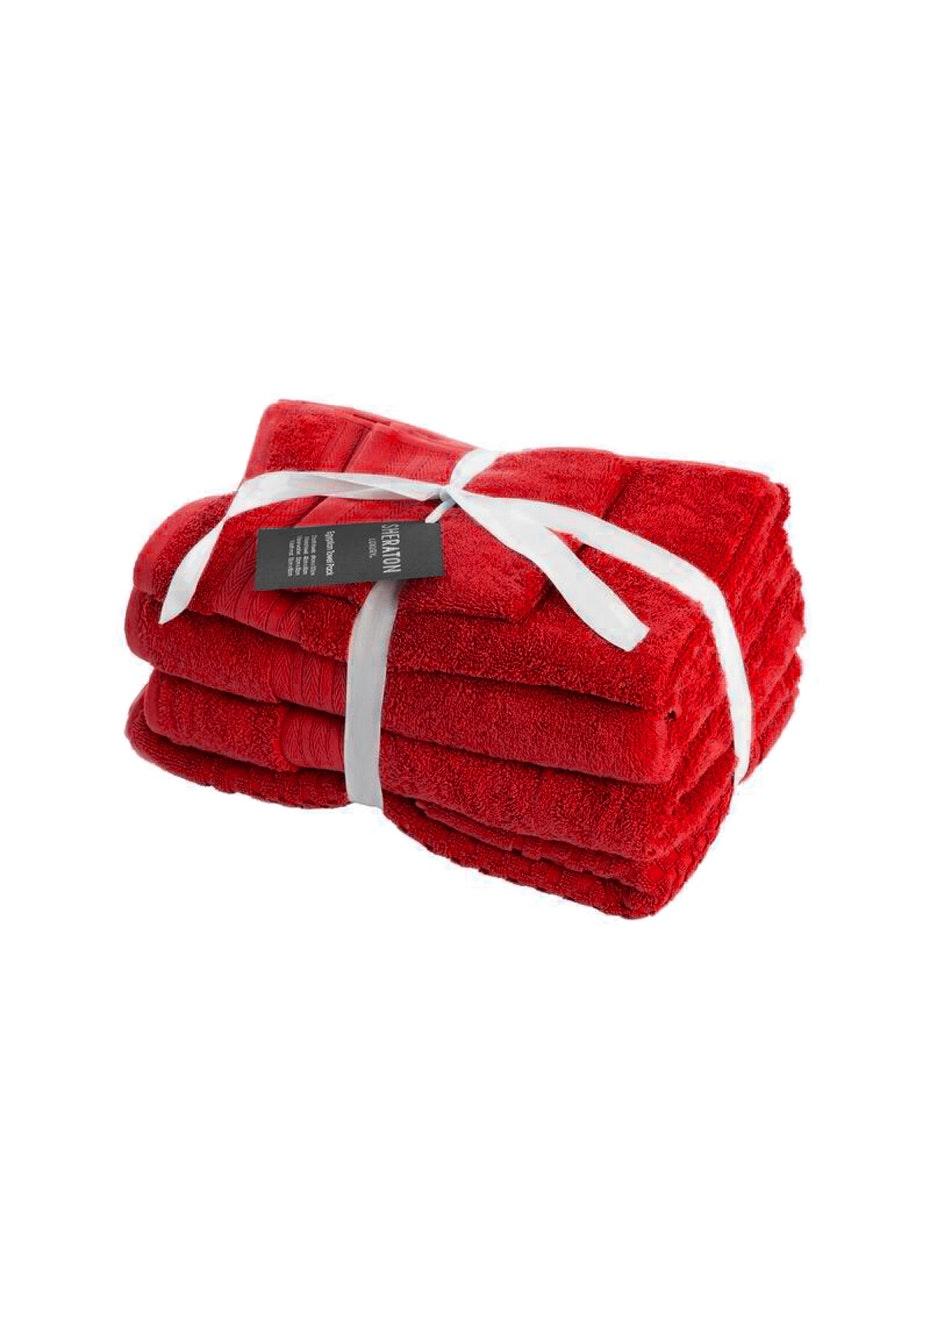 Sheraton Egptian 5 Piece Towel Pack - Colour Rouge